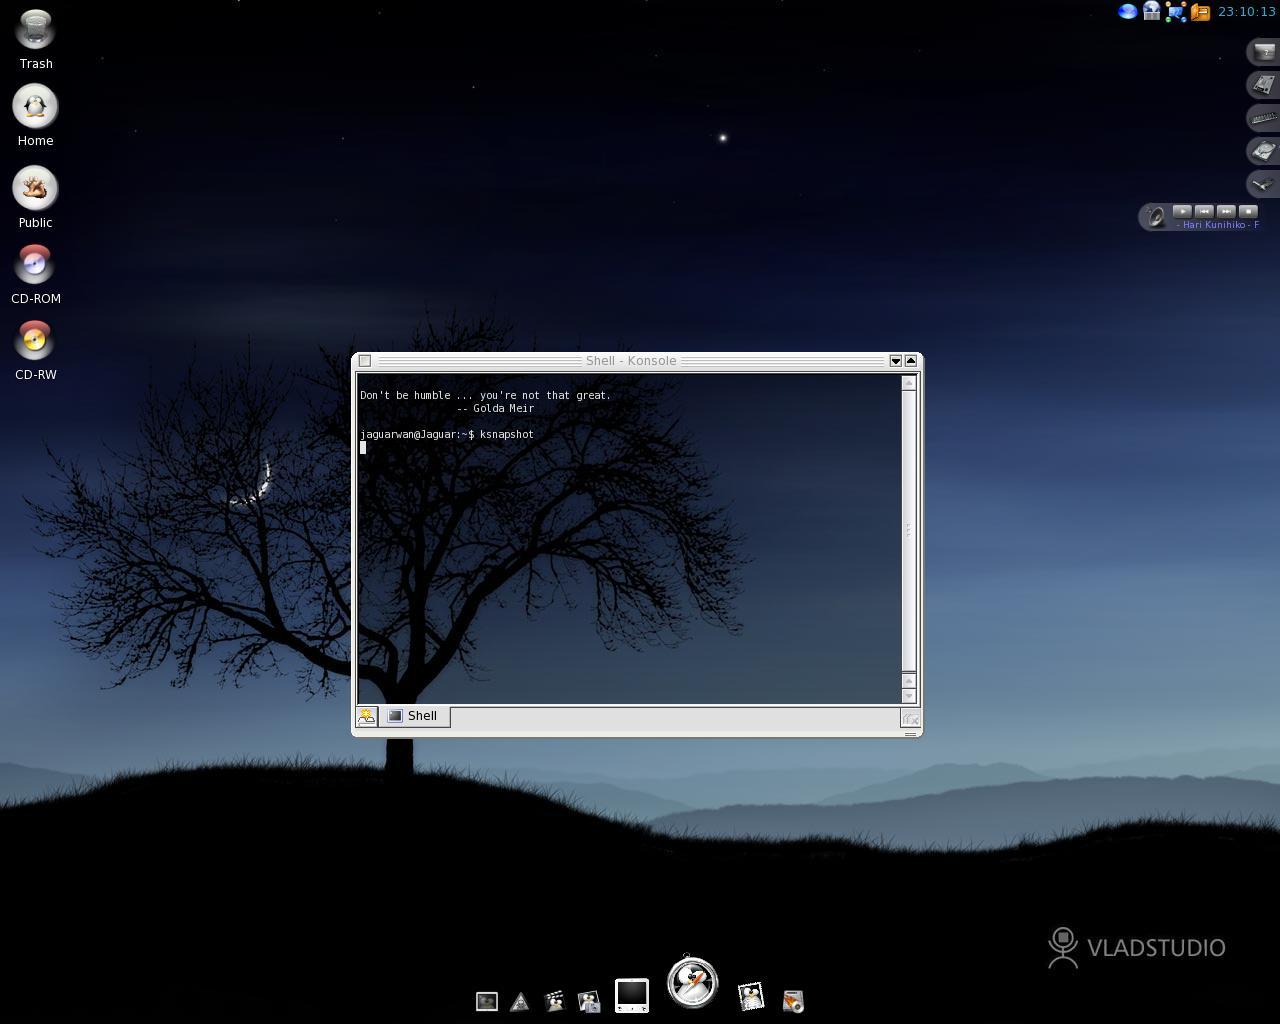 http://mammouth.tuxfamily.org/slackware/desktop.jpg